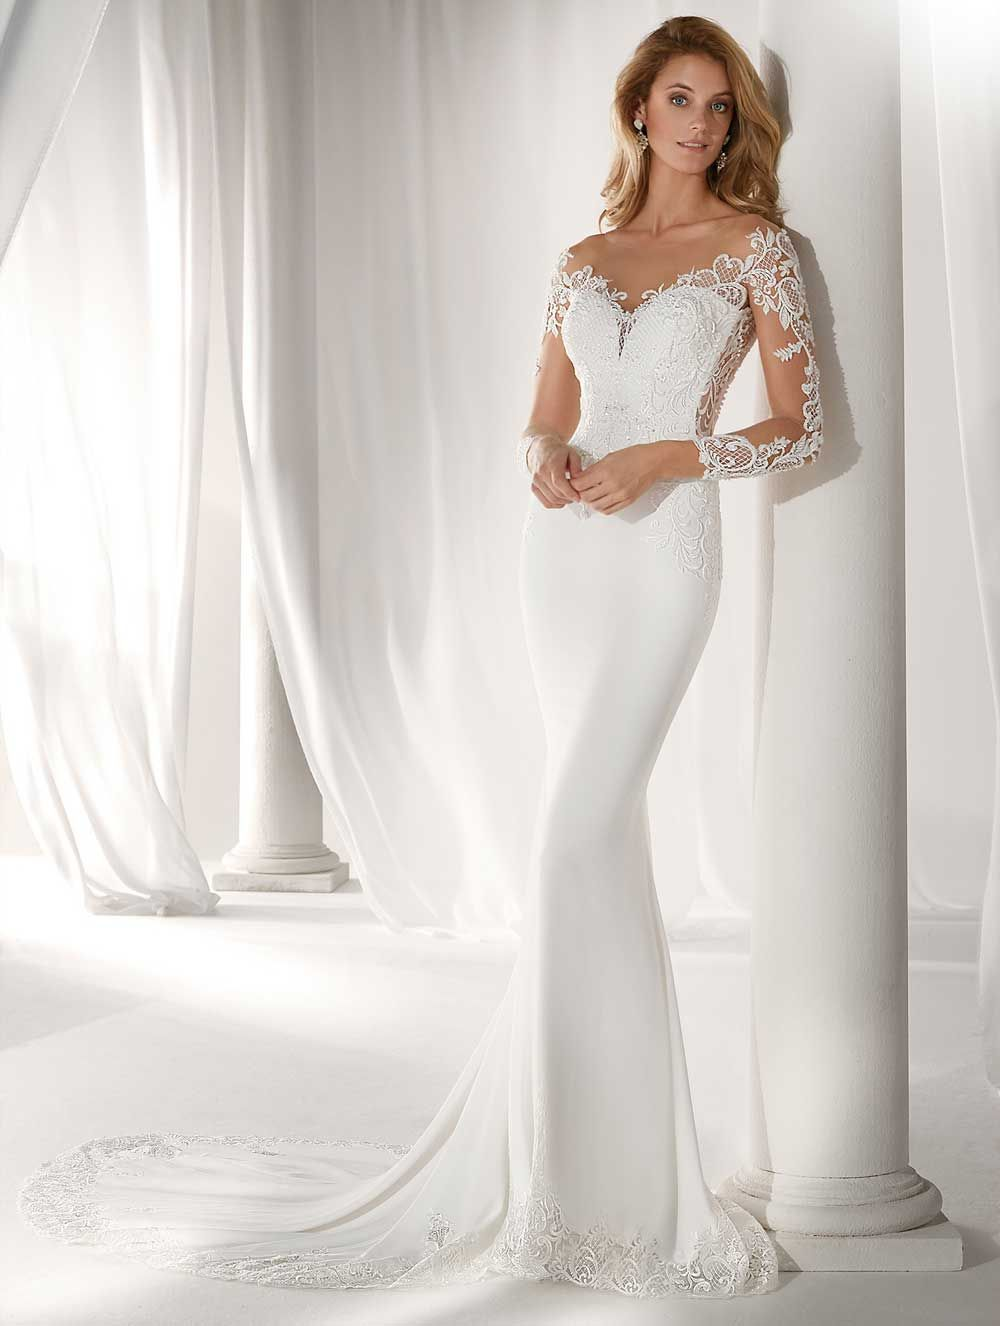 Abiti Da Sposa Sirena.Nicole Spose 2019 Gesamte Kleidersammlung Und Preise Abiti Da